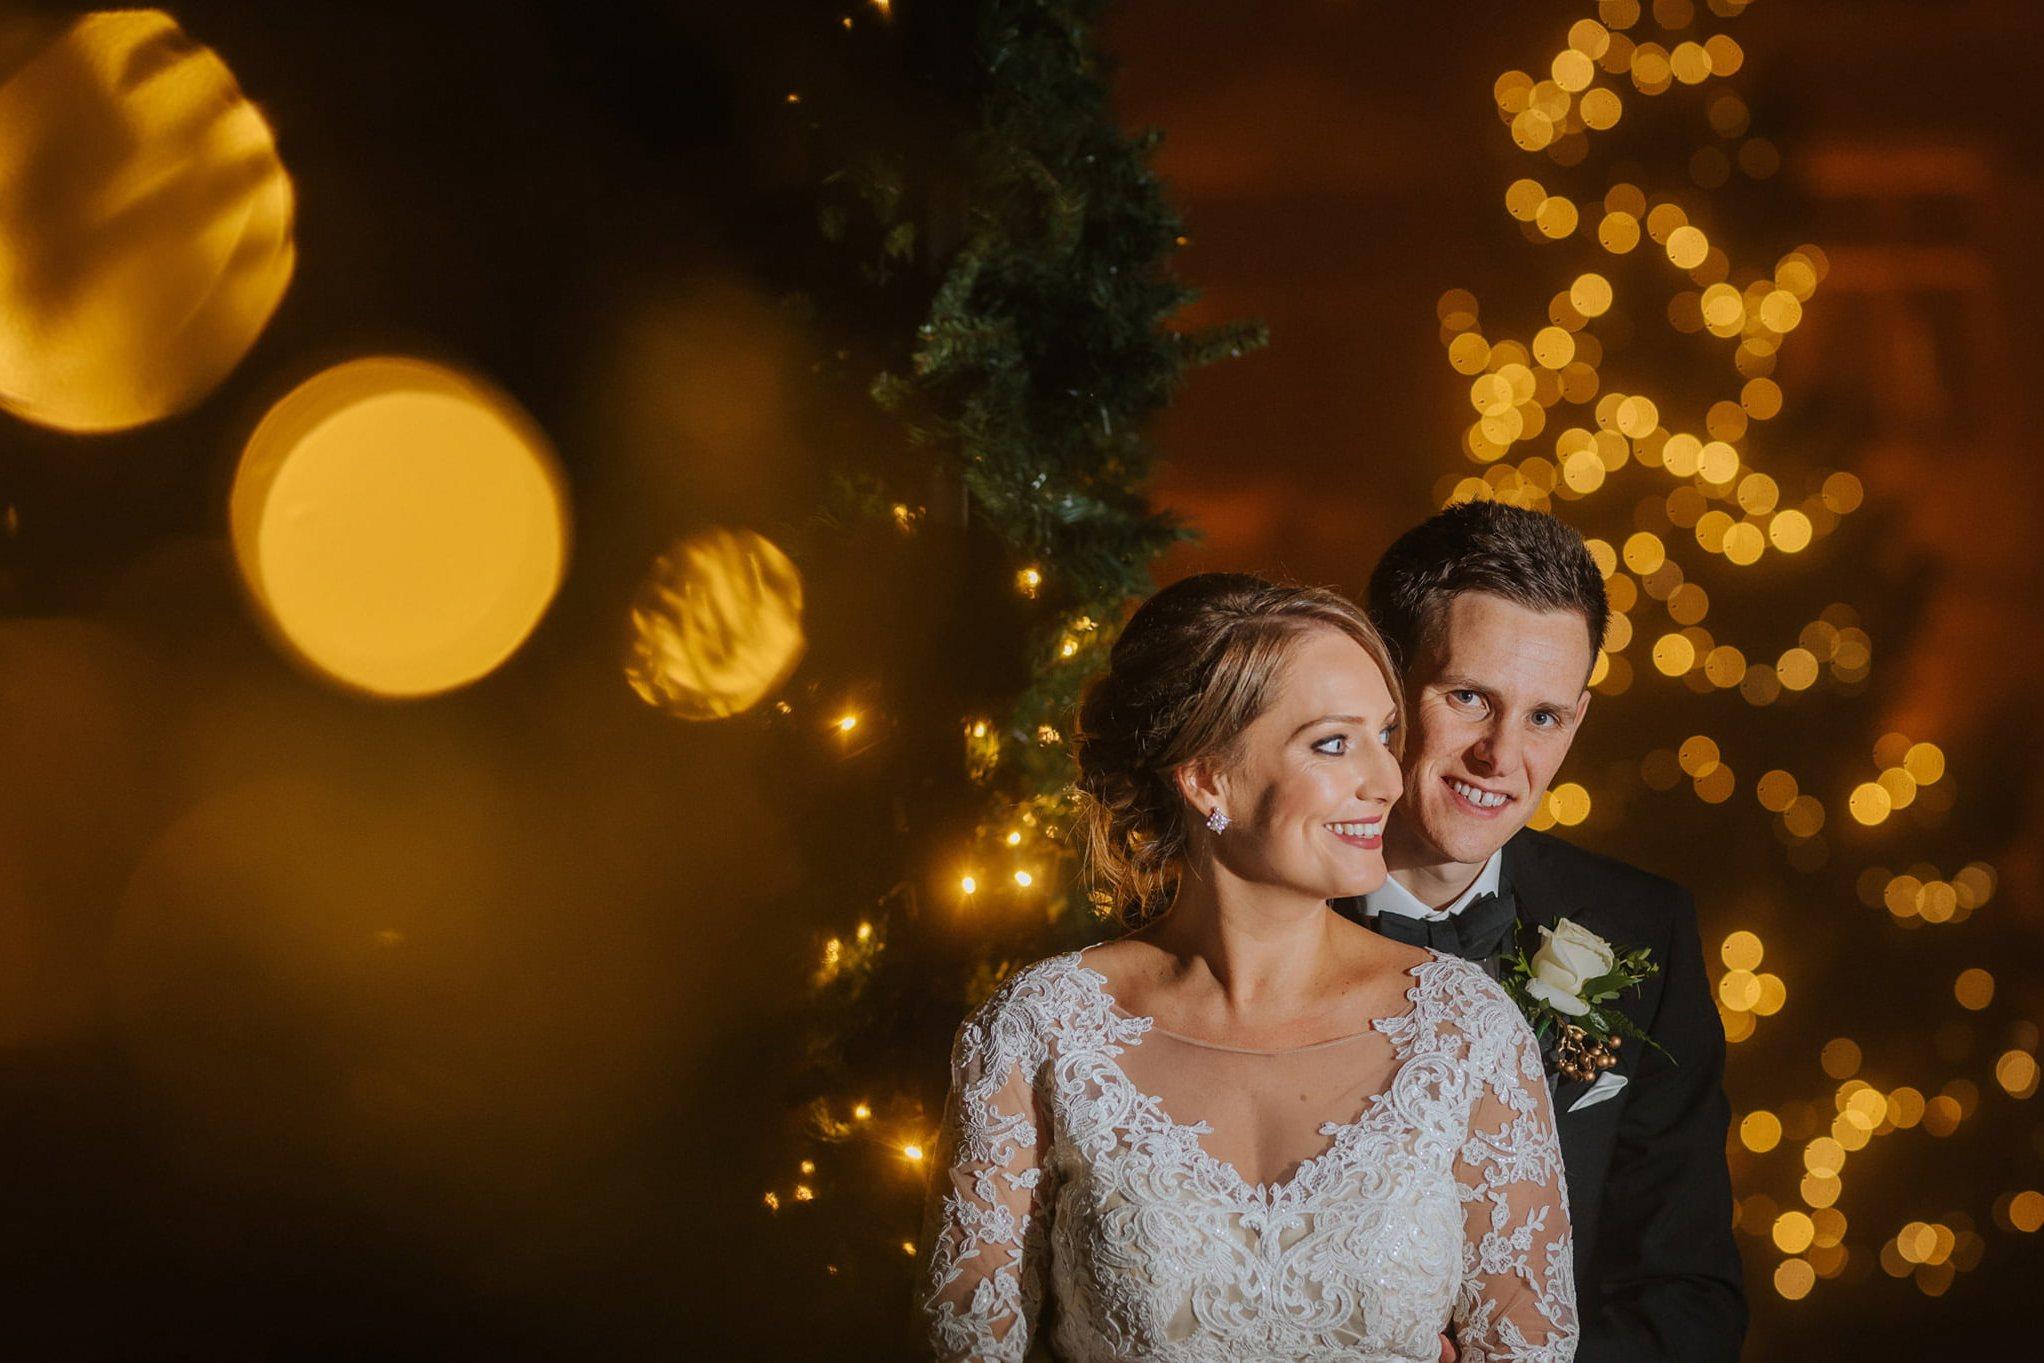 Coombe Abbey wedding in Coventry, Warwickshire - Sam + Matt 16